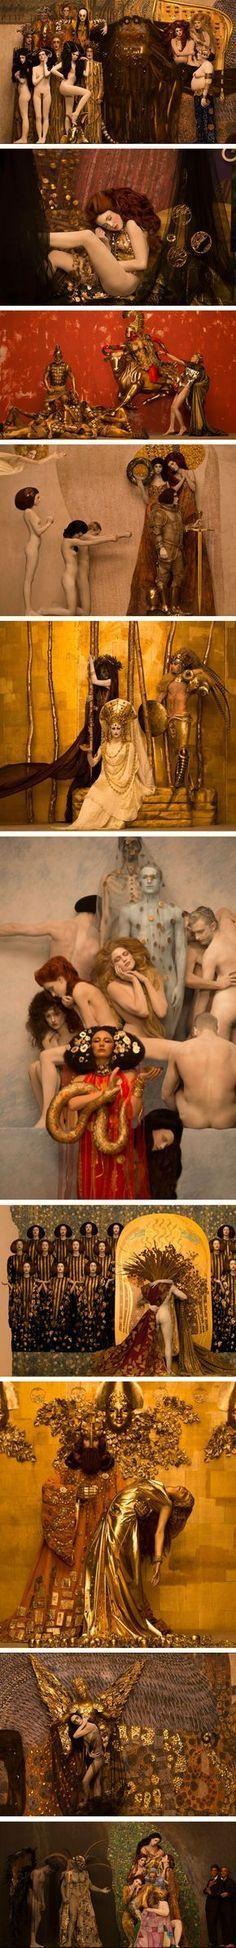 Gustav Klimt Brought to Life by Photographer Inge Prader.